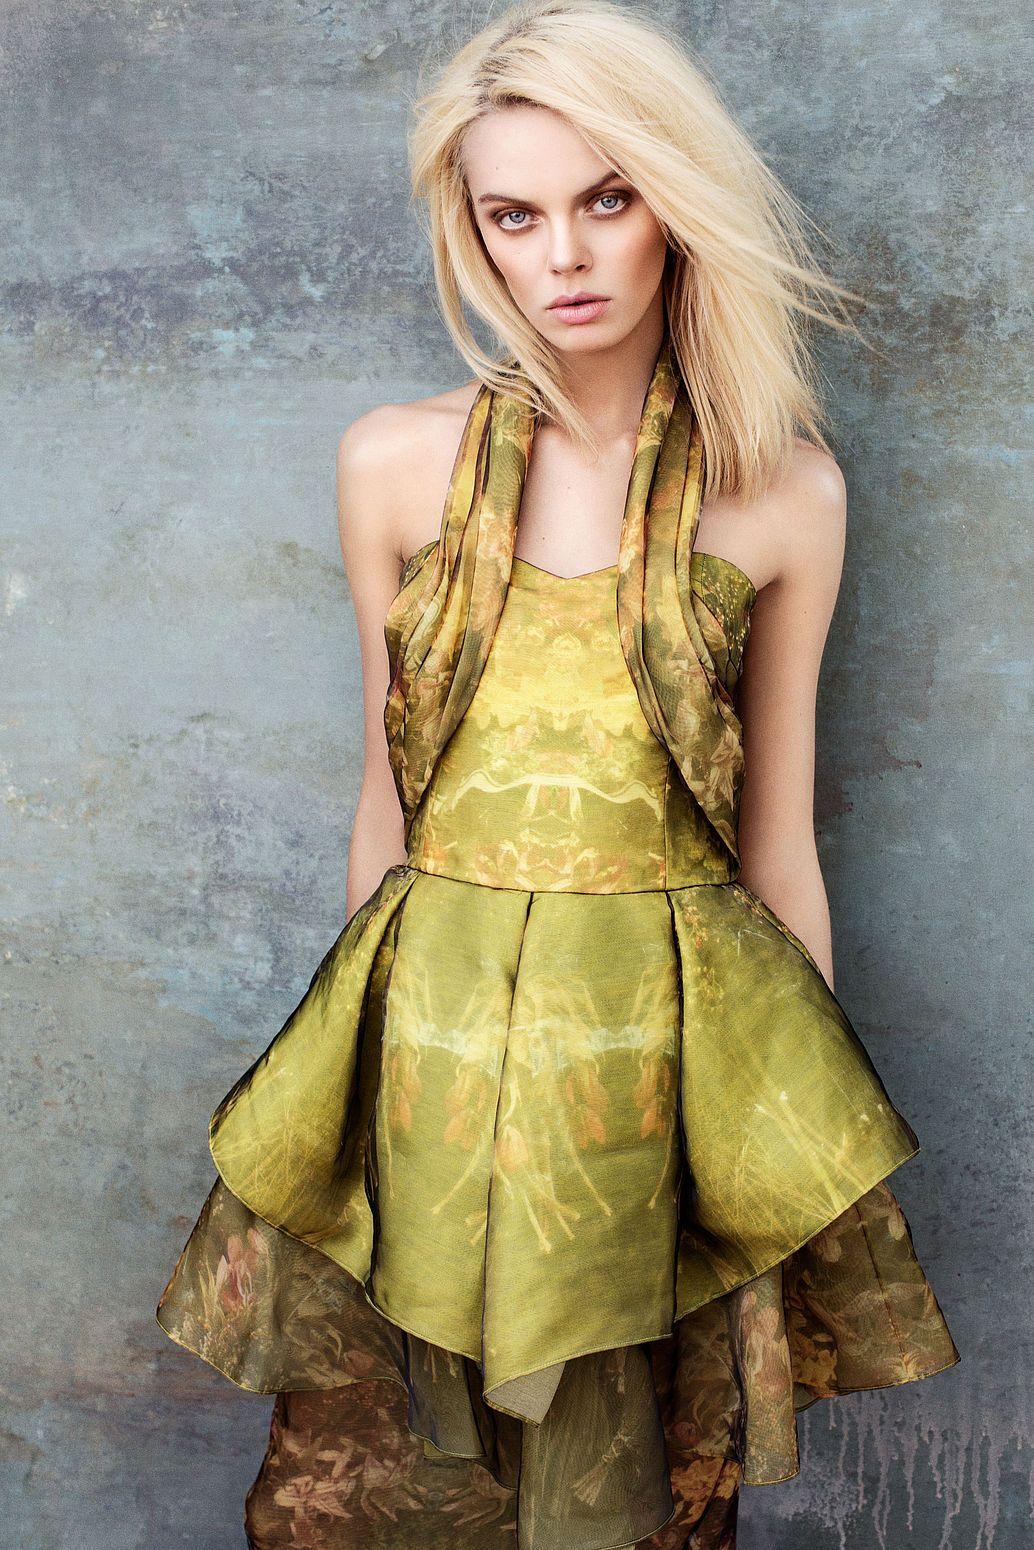 Oliphant backdrop/ Lara Jade | photography backdrops ...